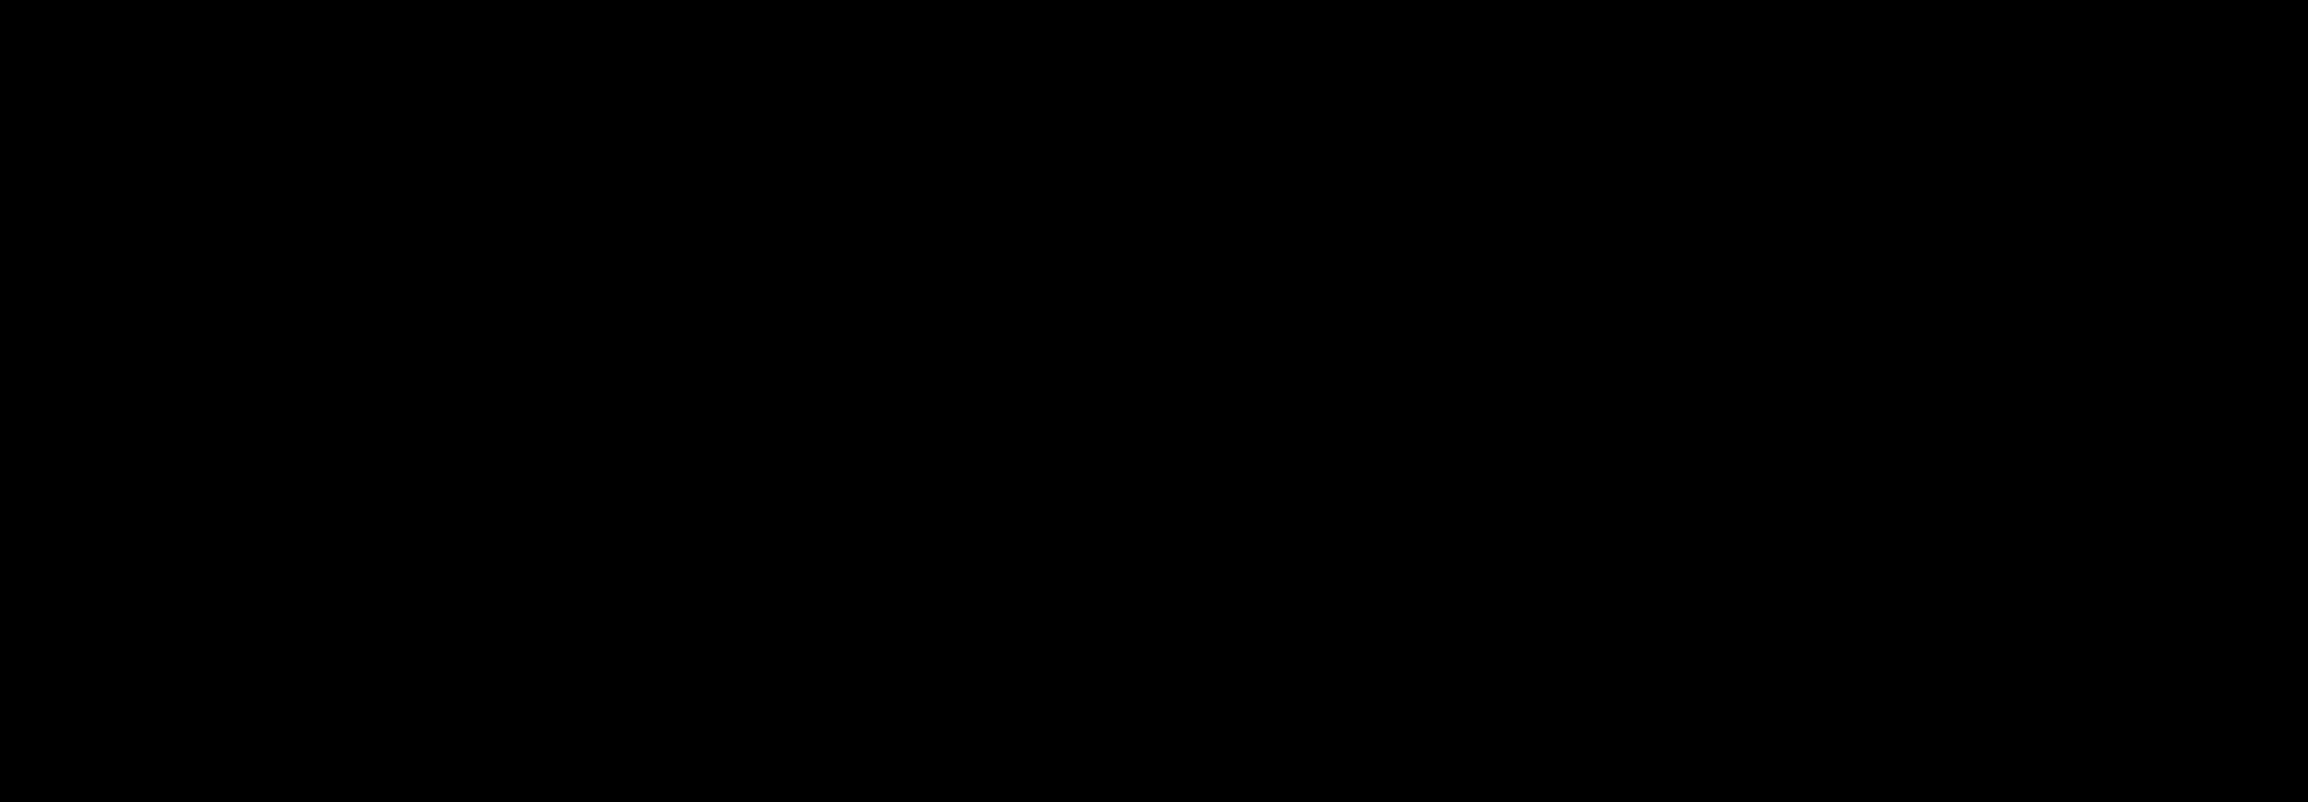 Fish symbol clipart clipart black and white stock Clipart - God Fish clipart black and white stock